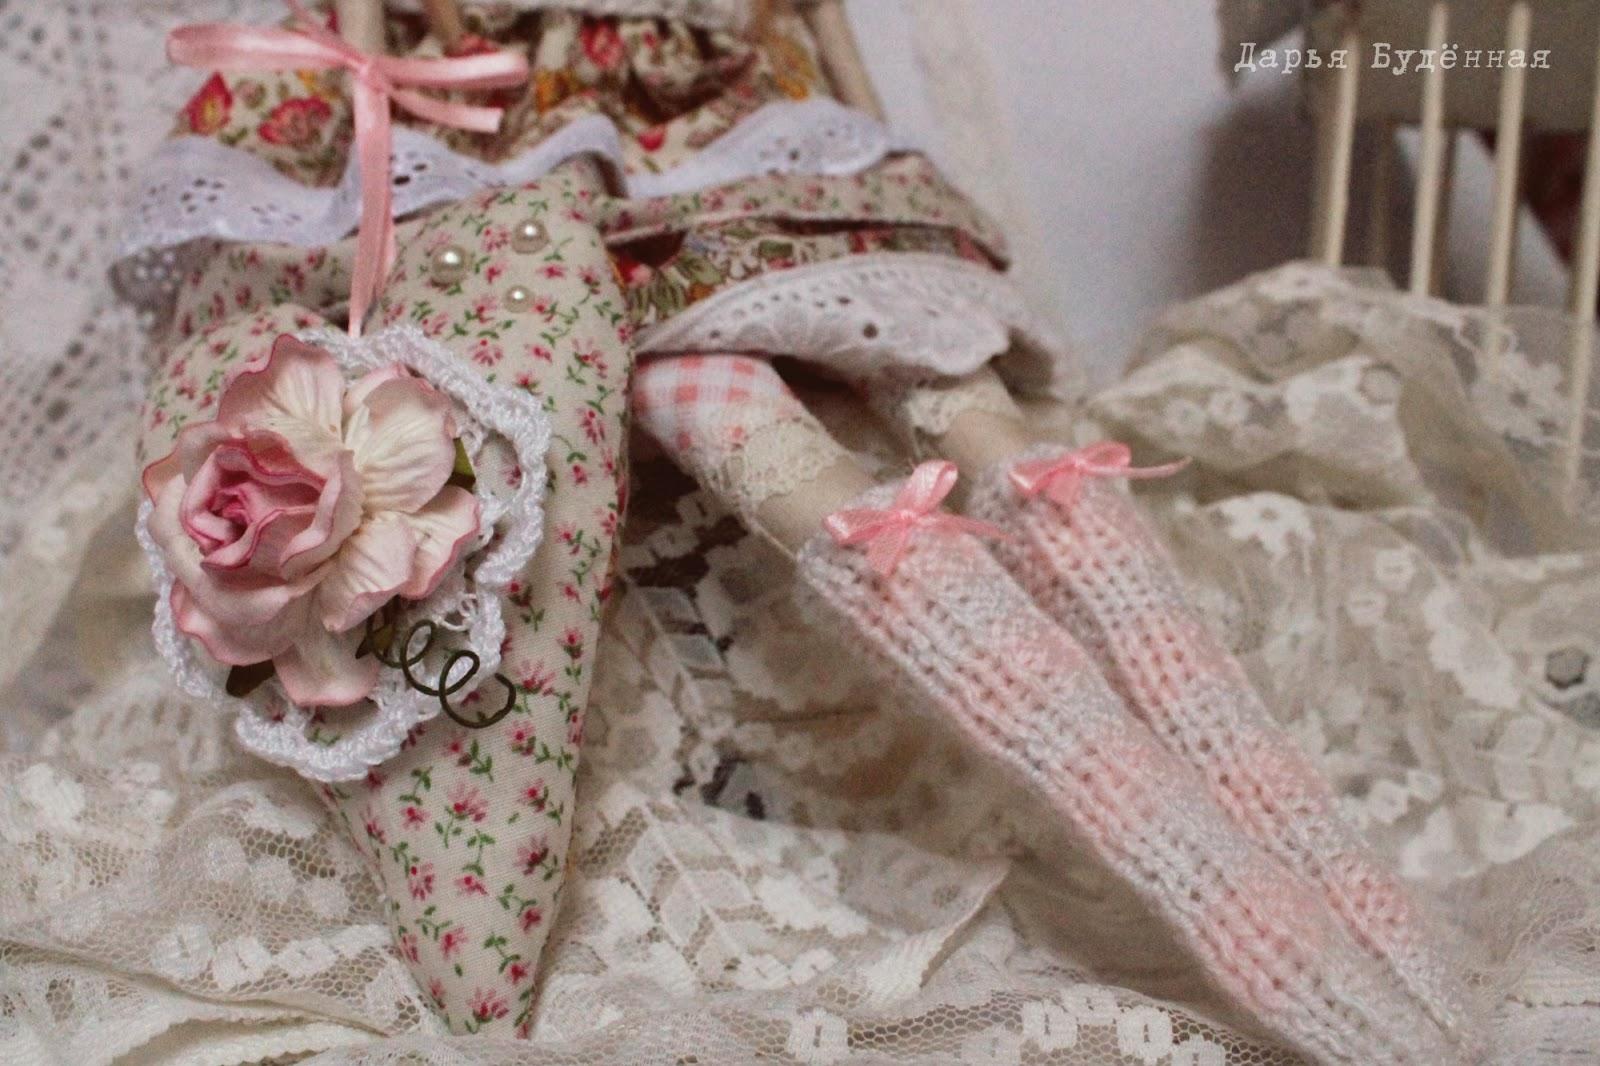 розовый, шебби шик, винтаж, тильда, алматы